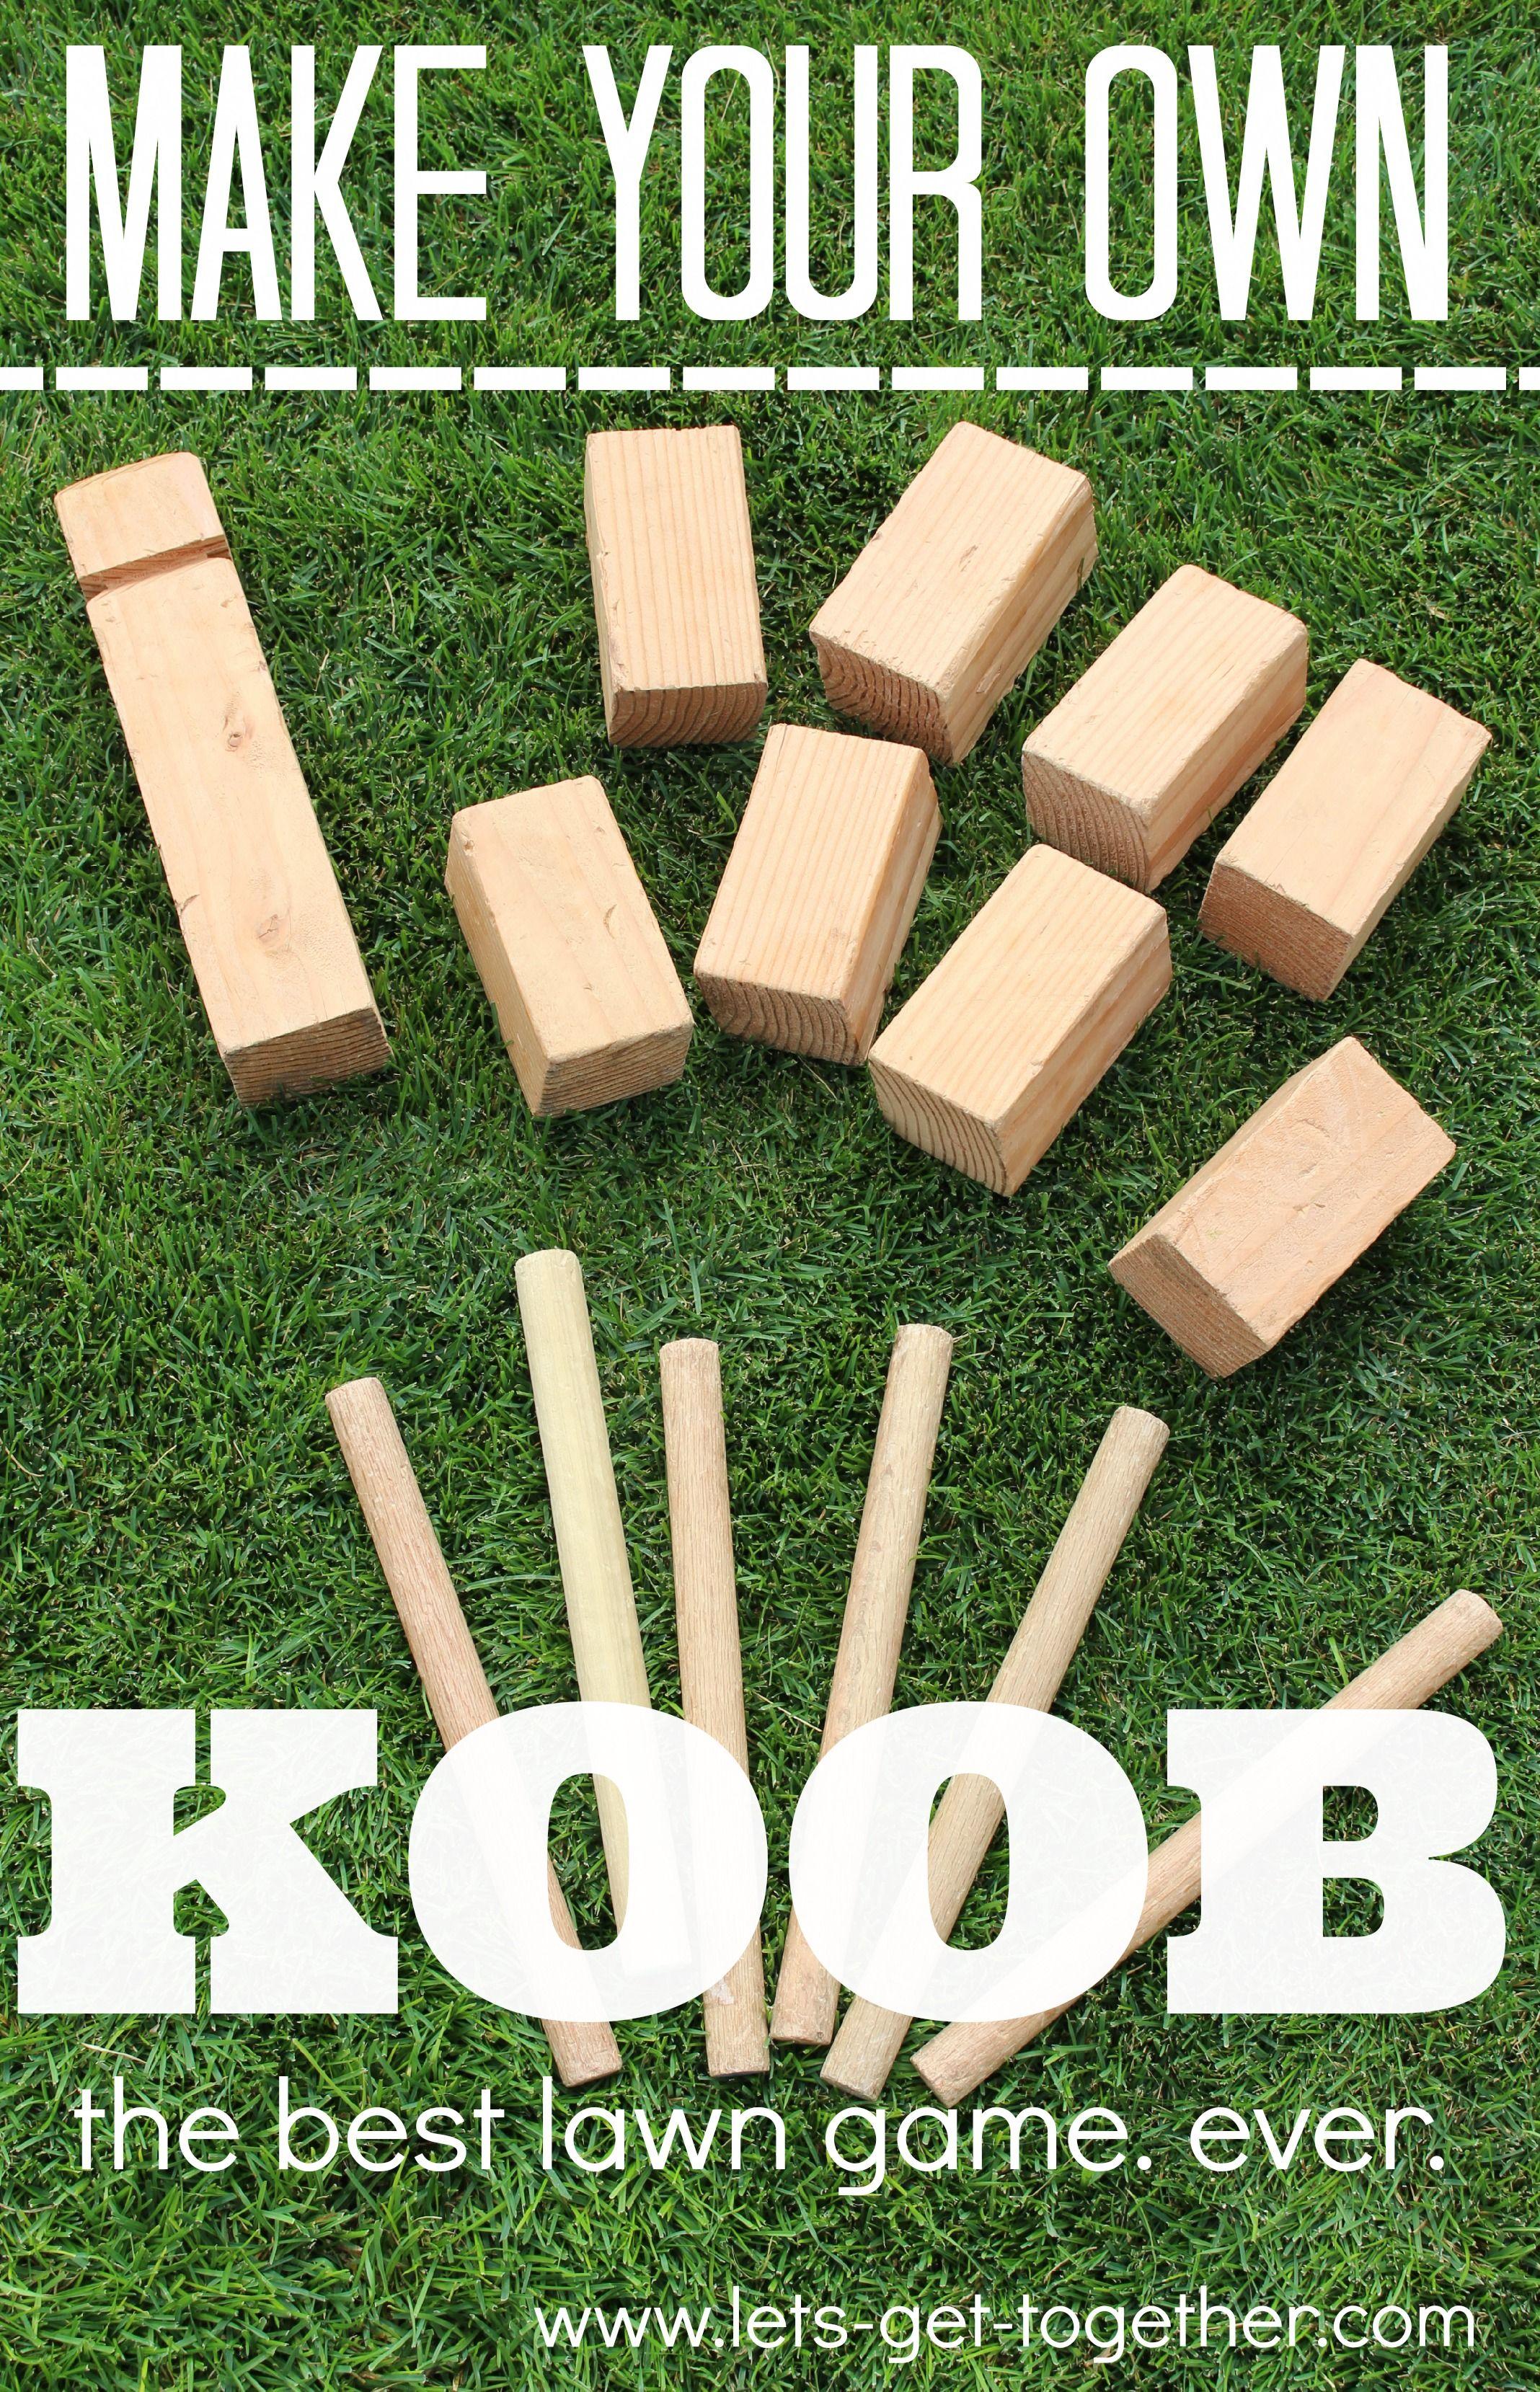 DIY KOOB (The Best Lawn Game. Ever.) Diy yard games